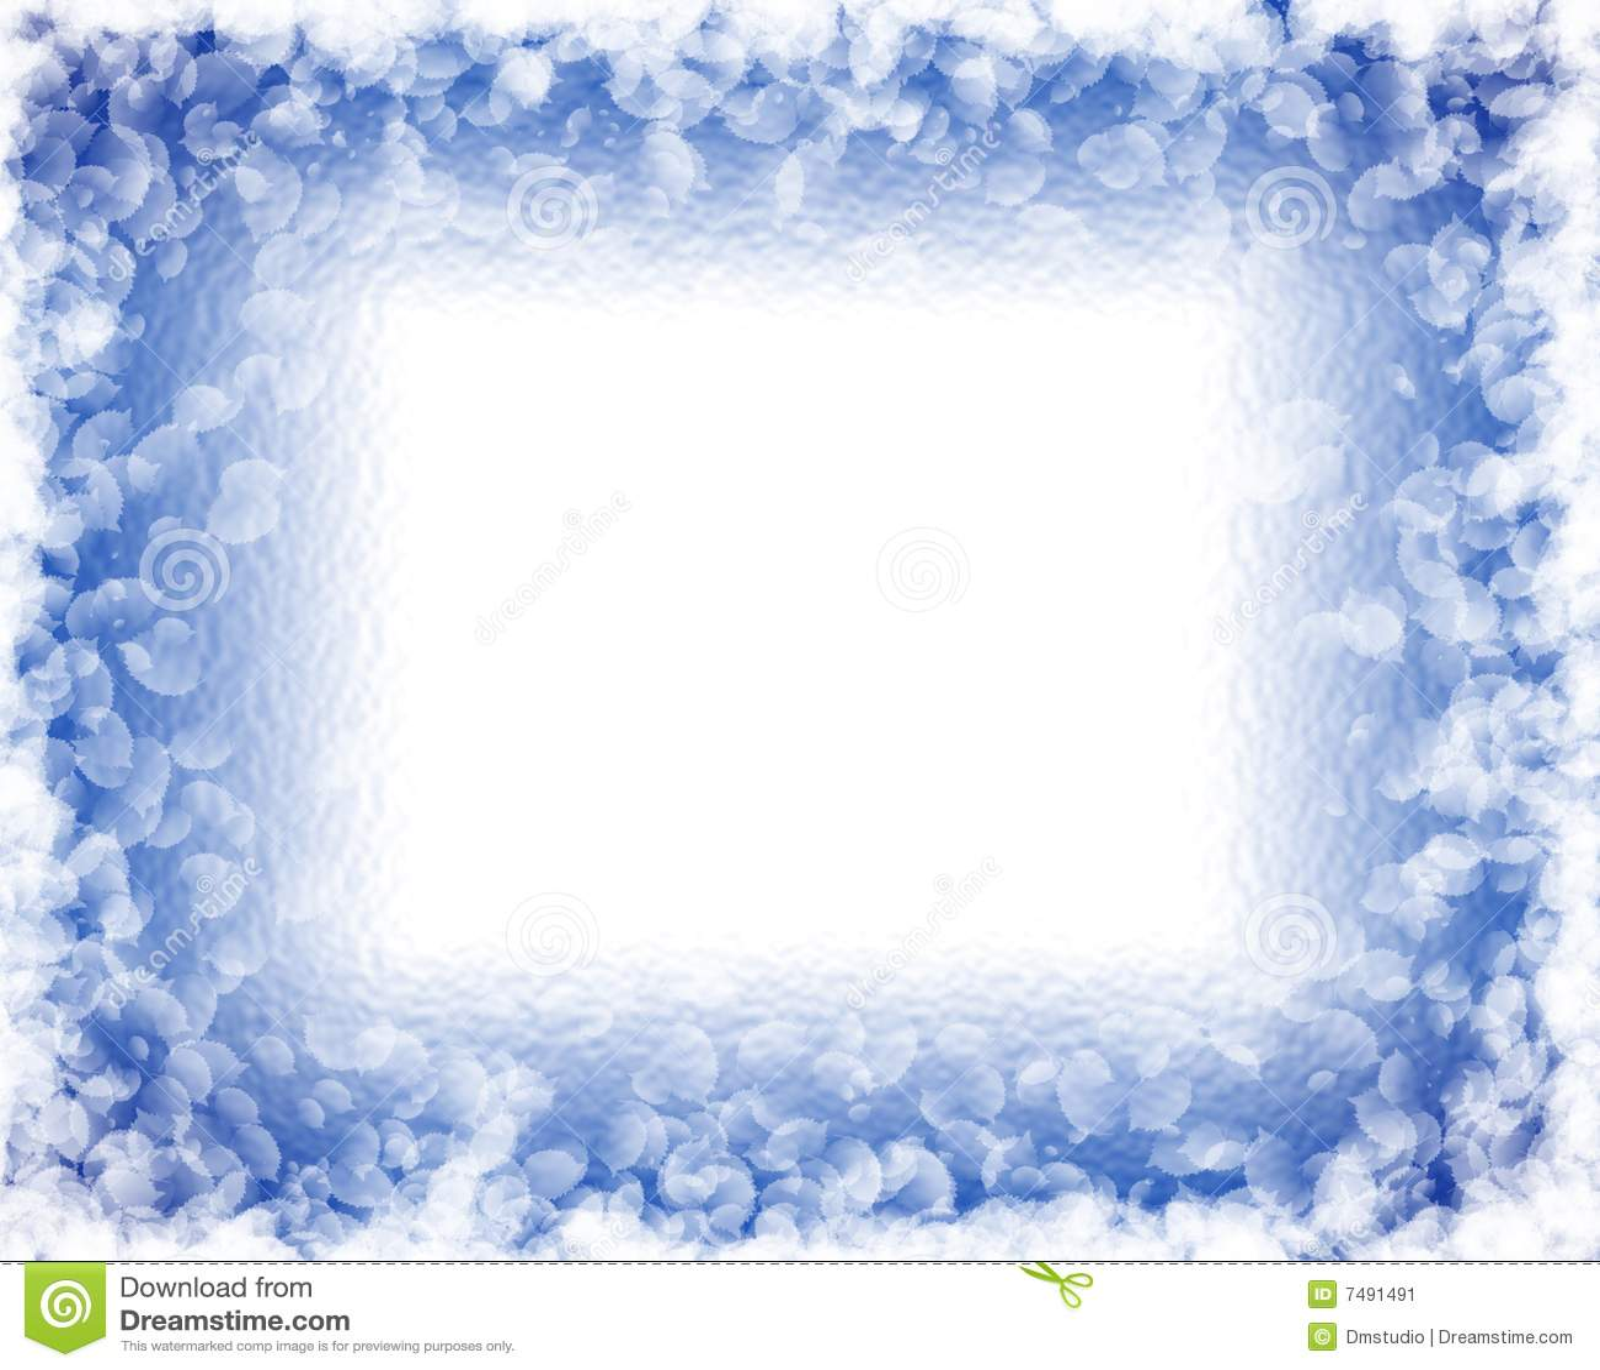 White Leaves On Ice Stock Image - Image: 7491491